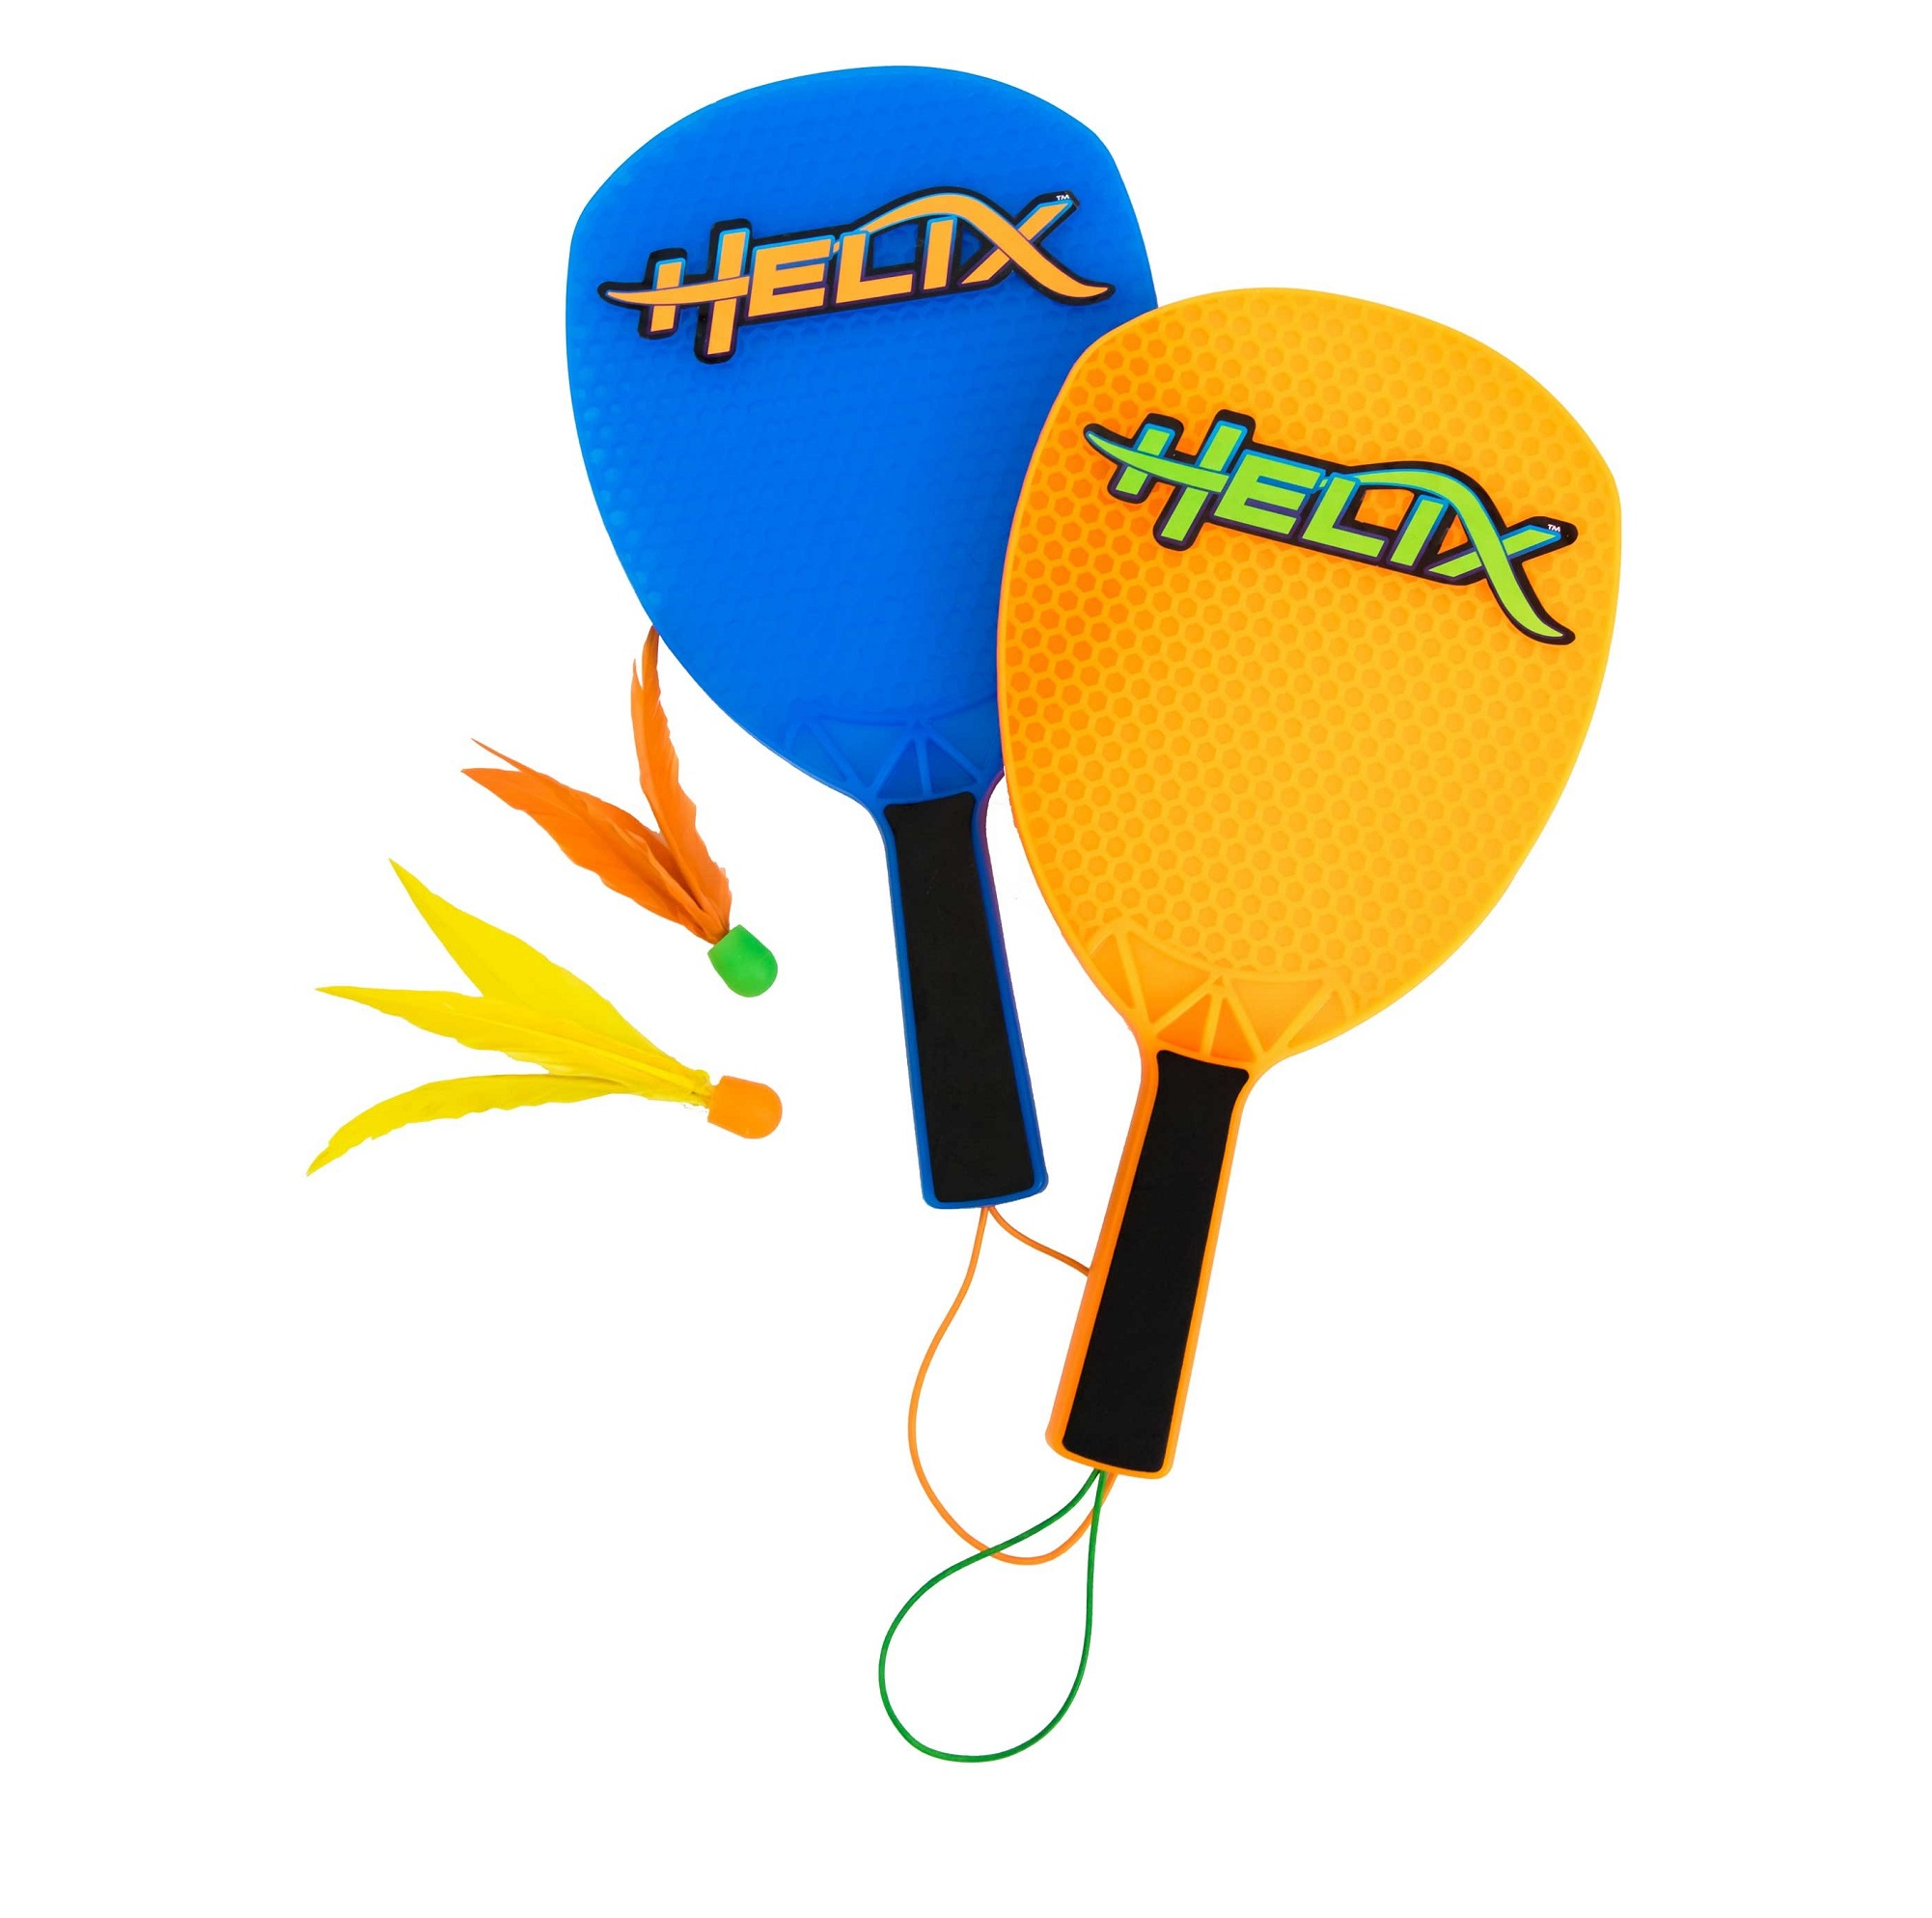 Набор для игры в бадминтон Yulu helix fun